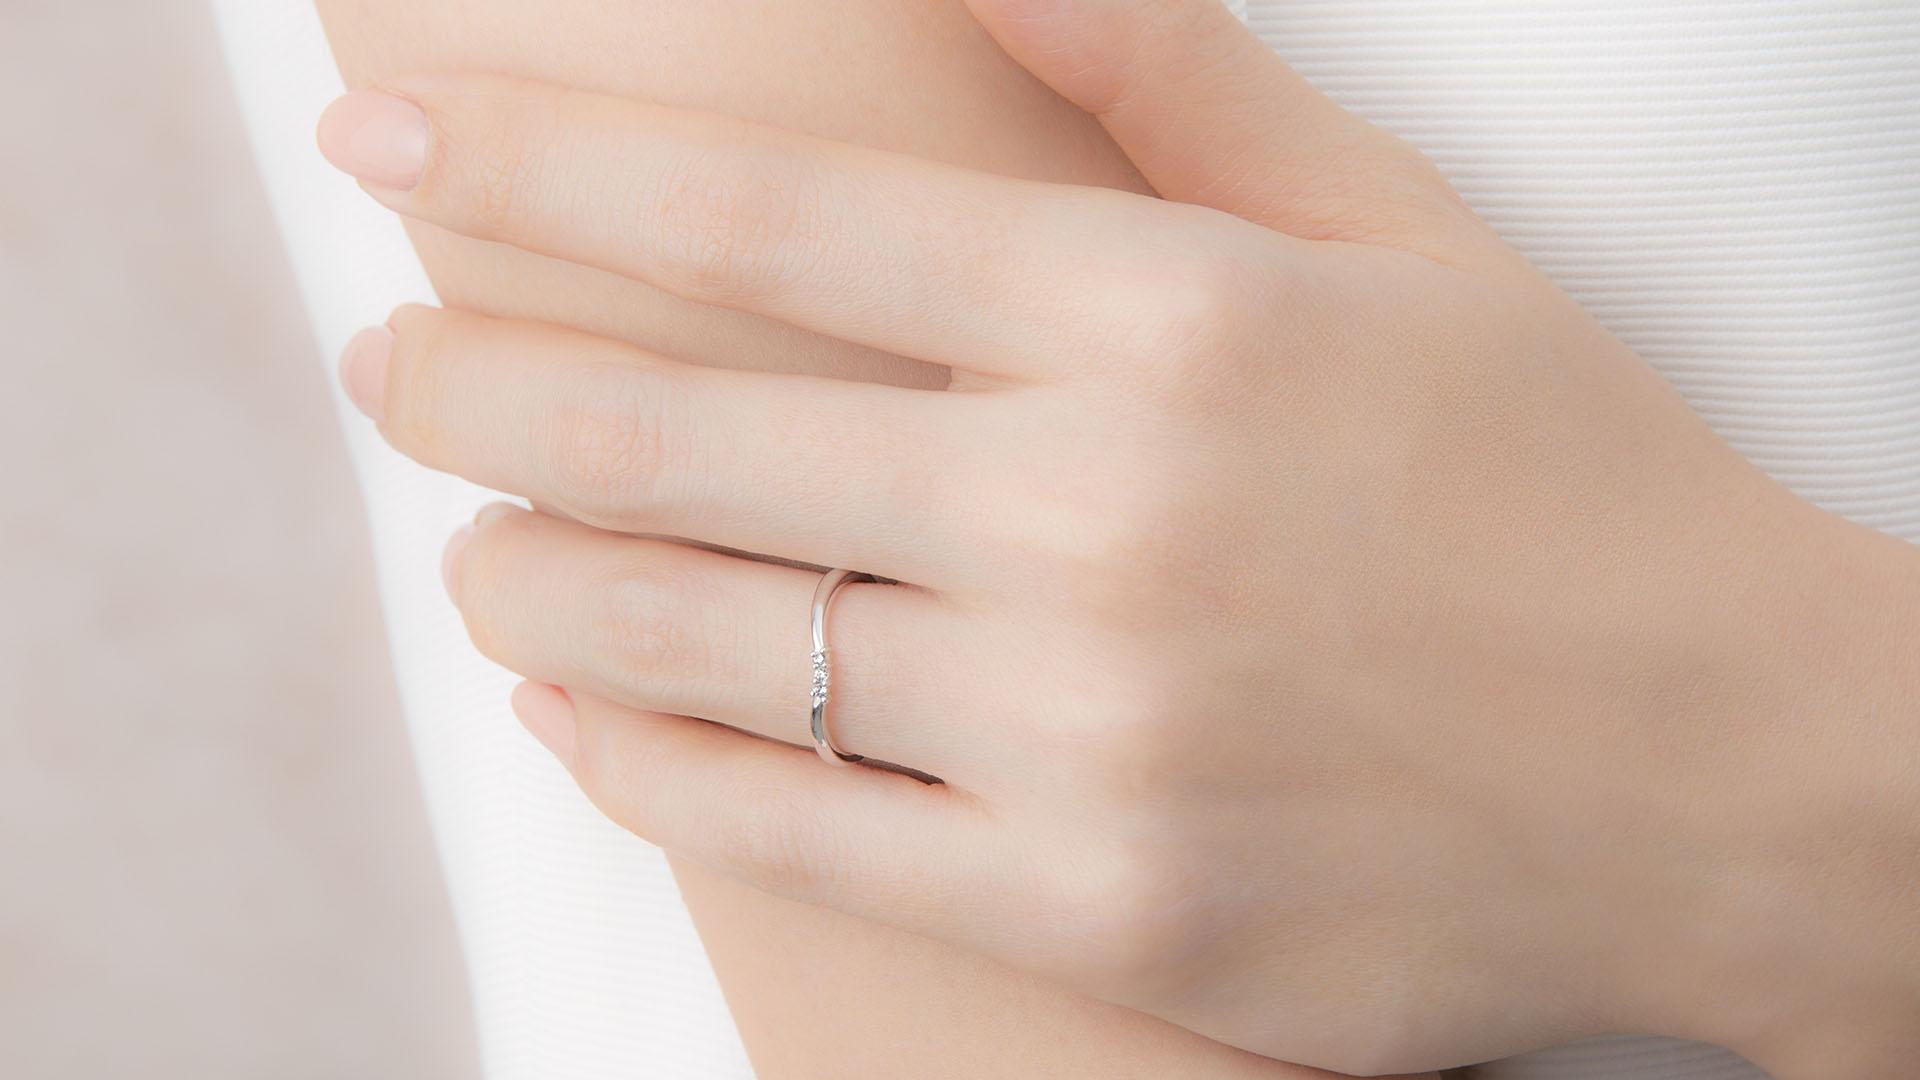 napaea ナパイア   結婚指輪サムネイル 3